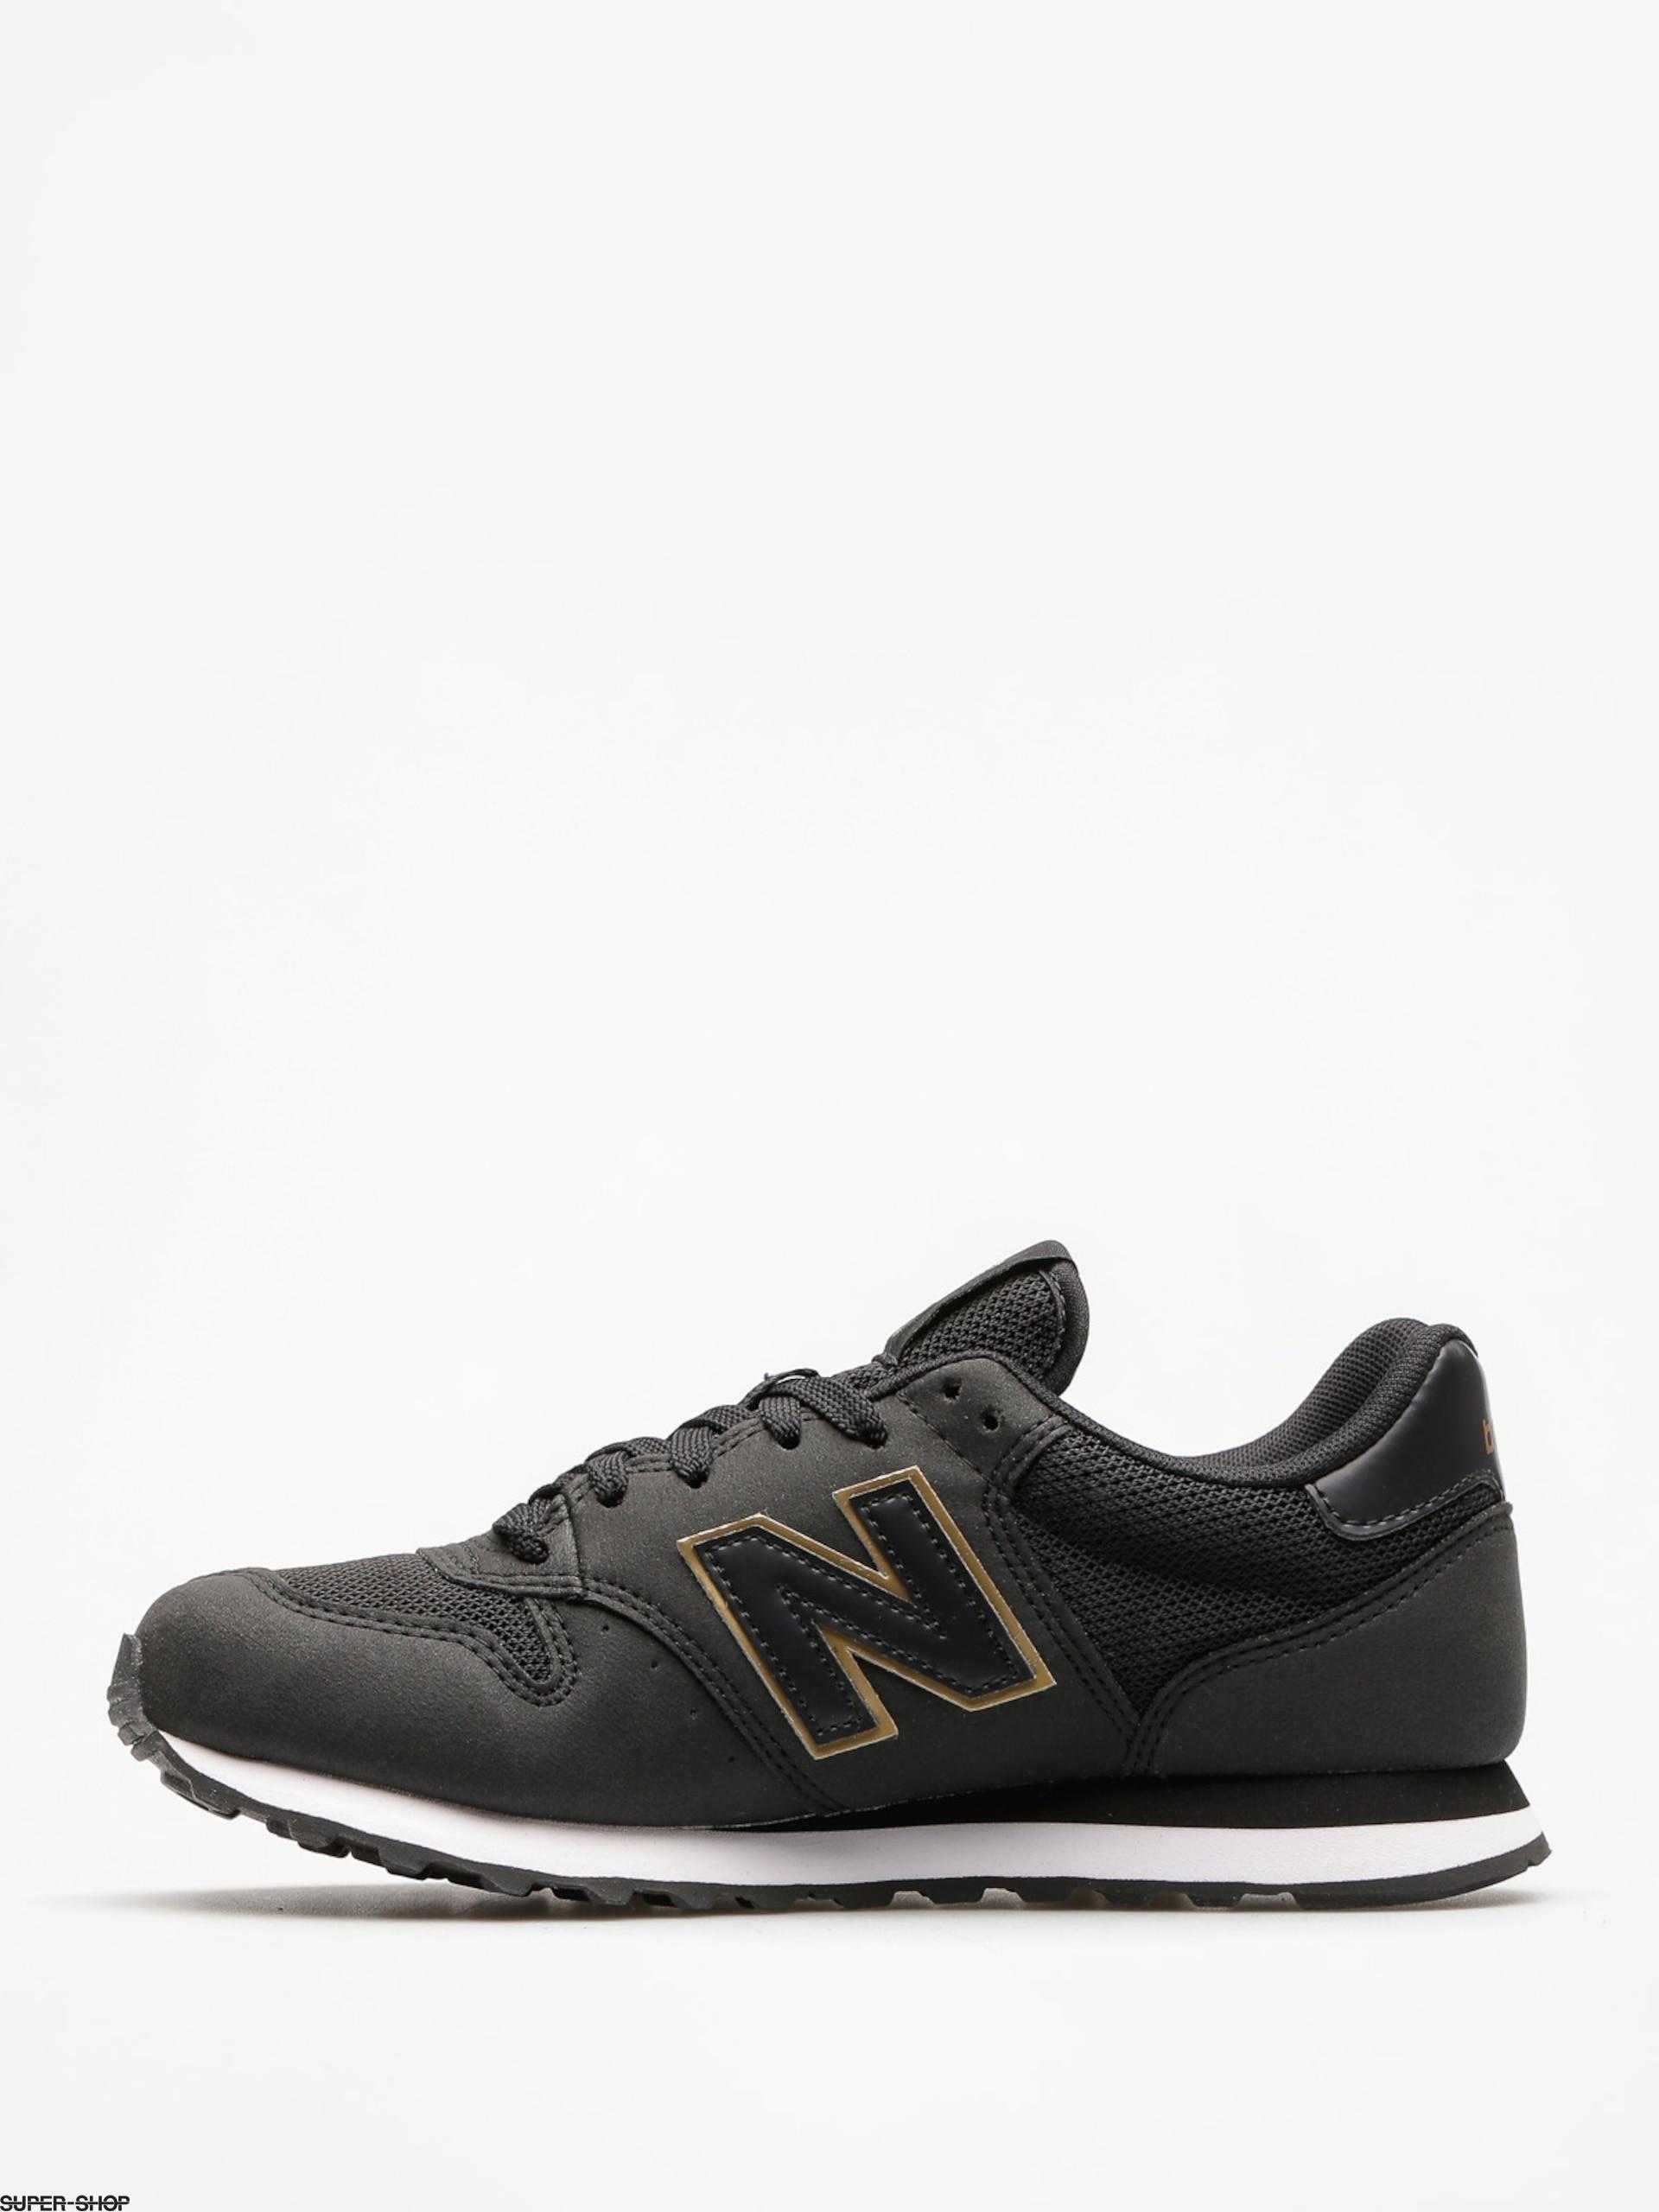 New Balance Shoes 500 Wmn (black/gold)